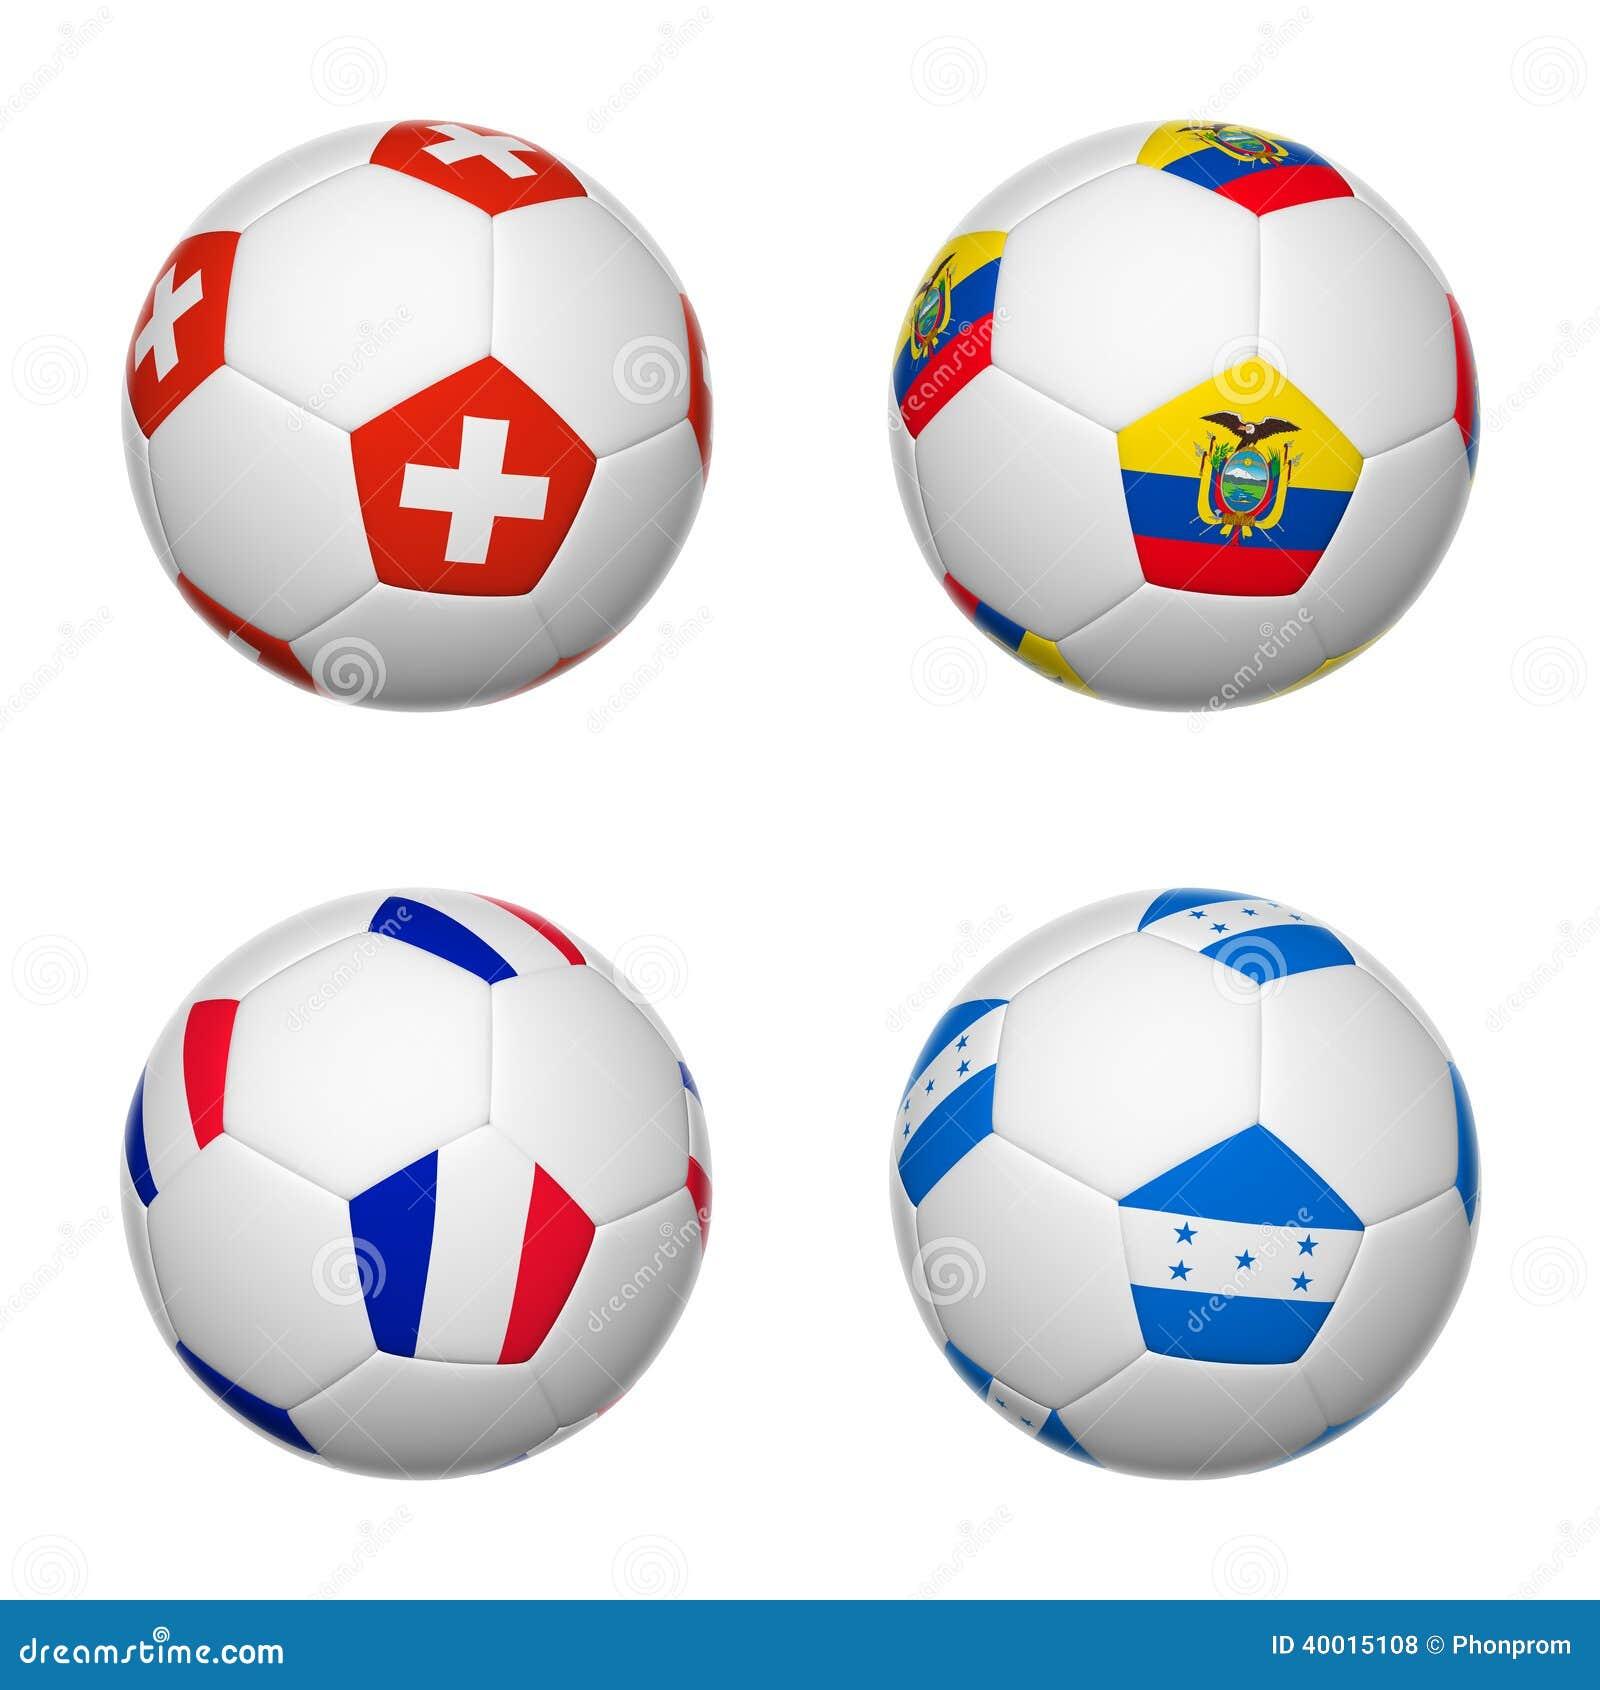 Ballons de football du Brésil 2014, groupe E